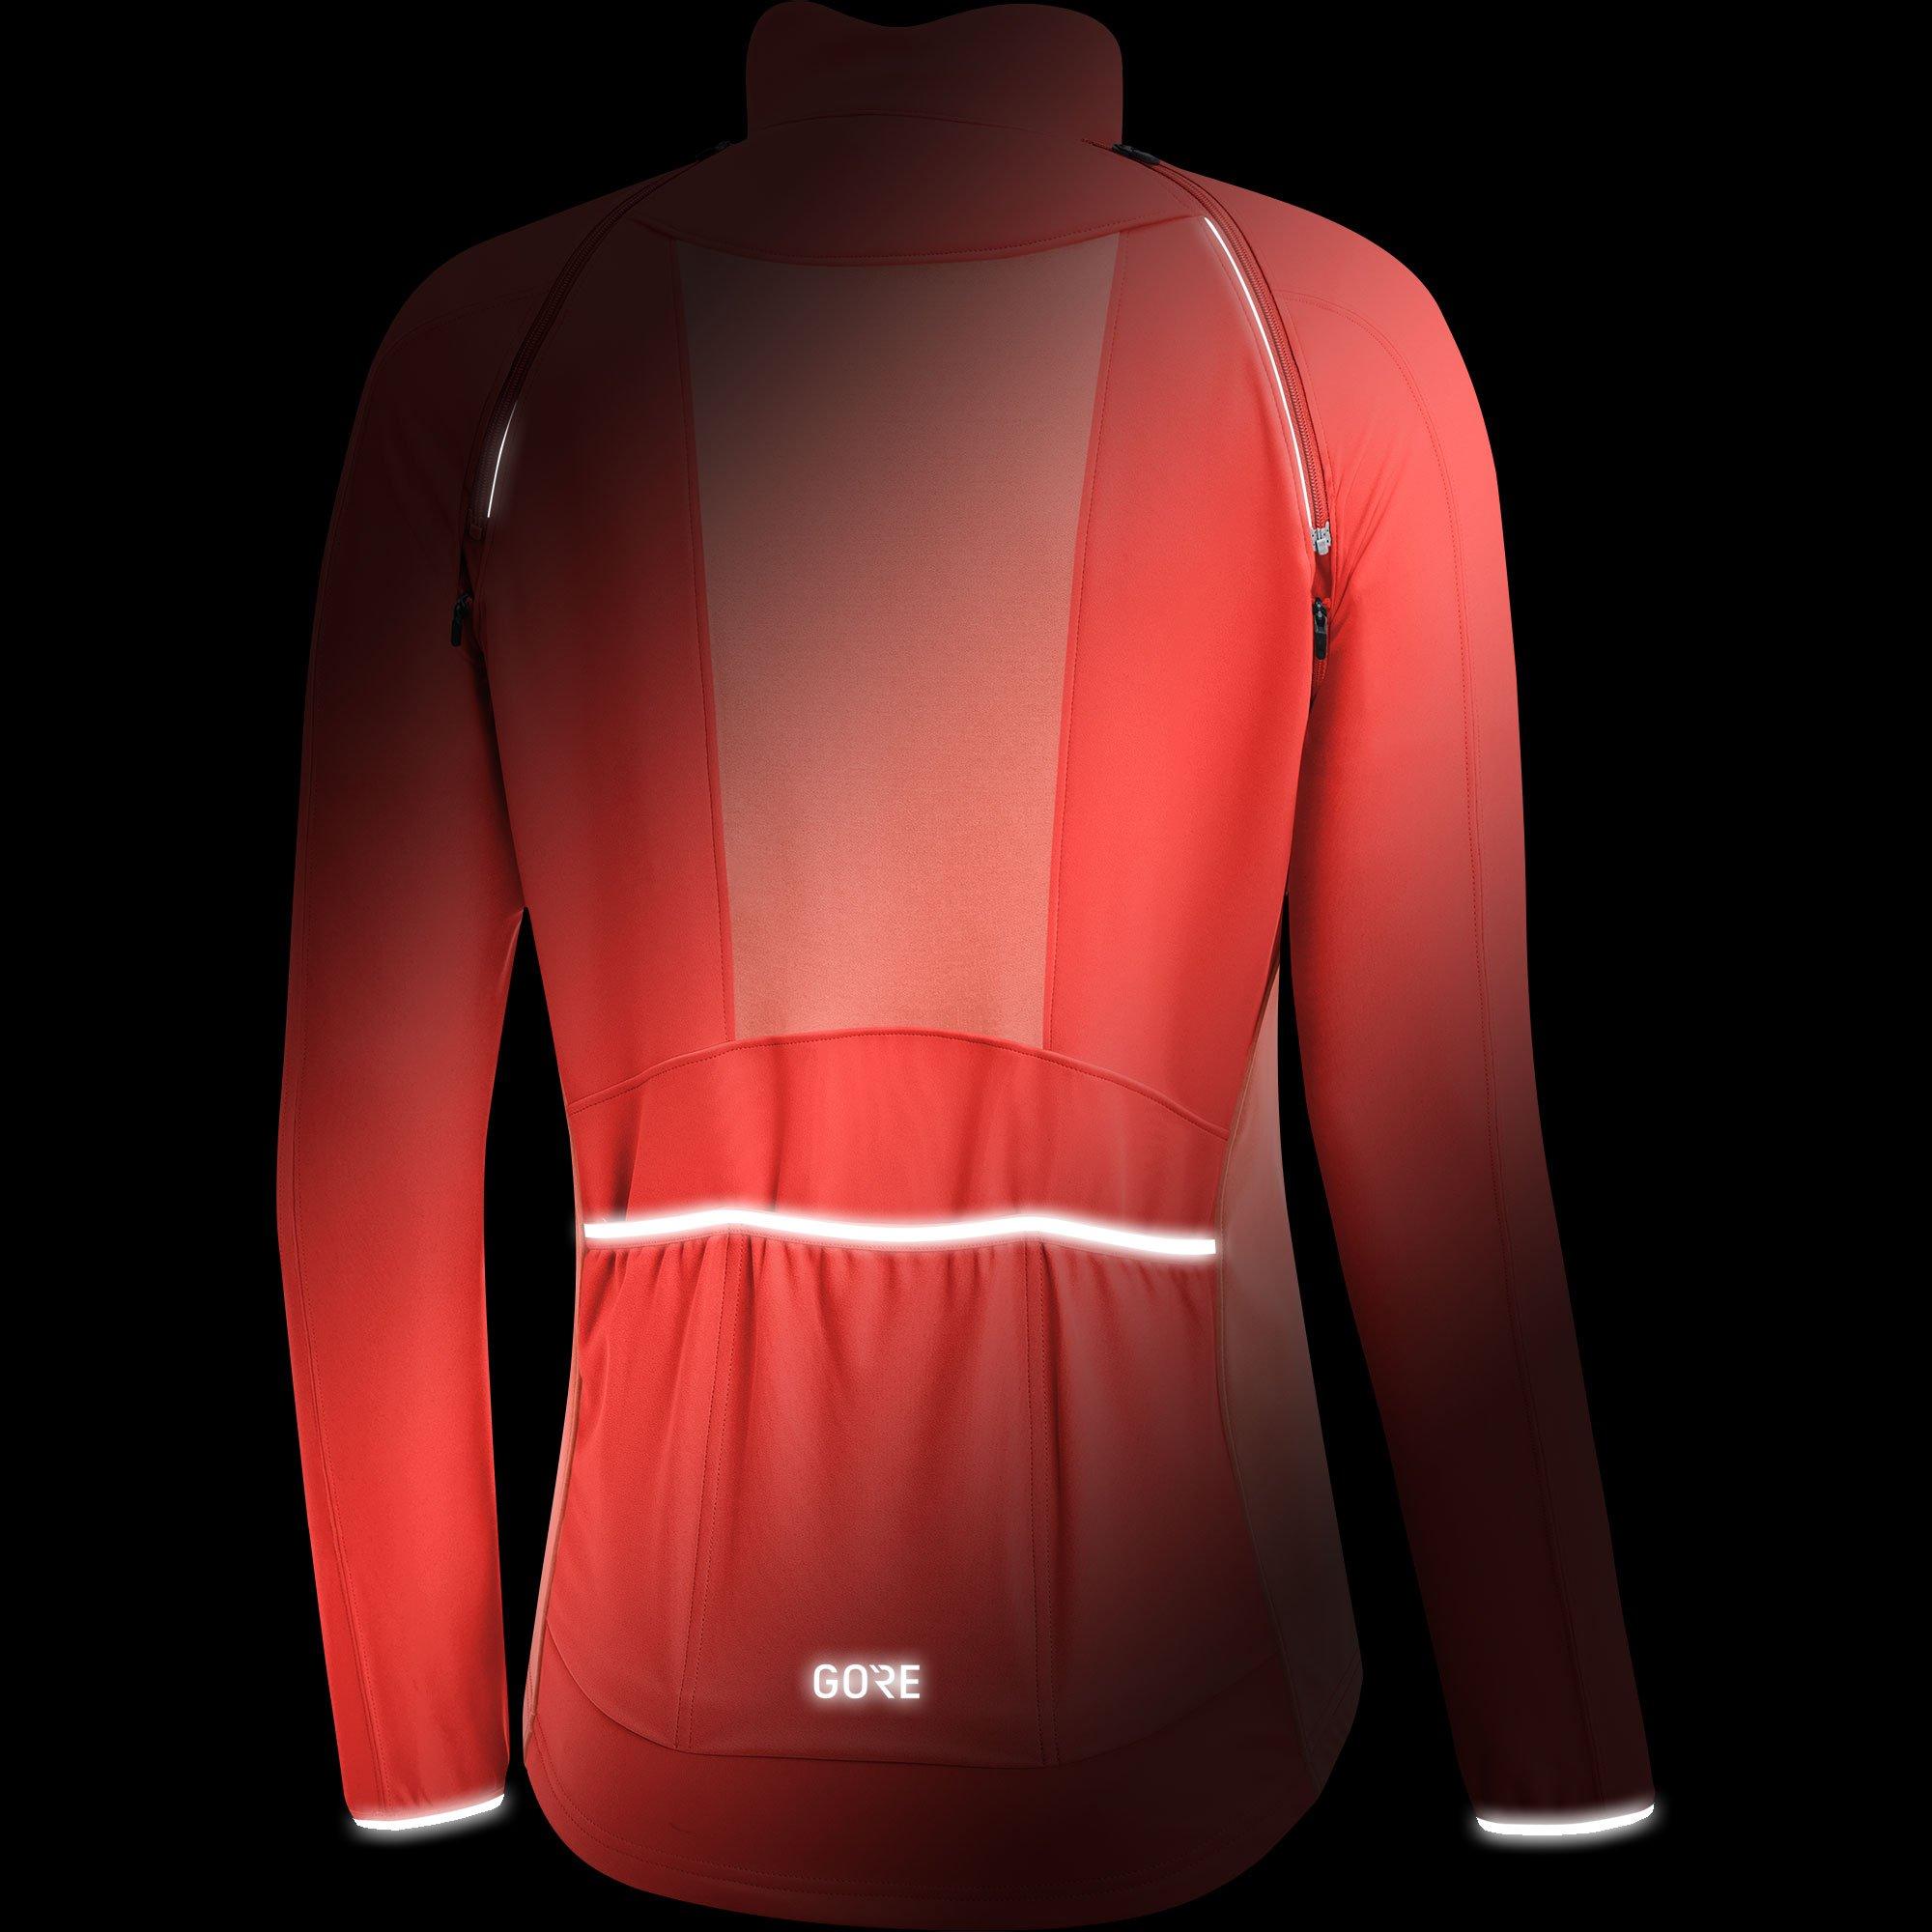 GORE Wear Women's Windproof Cycling Jacket, Removable Sleeves, GORE Wear C3 Women's GORE Wear WINDSTOPPER Phantom Zip-Off Jacket, Size: M, Color: Lumi Orange/Coral Glow, 100191 by GORE WEAR (Image #4)